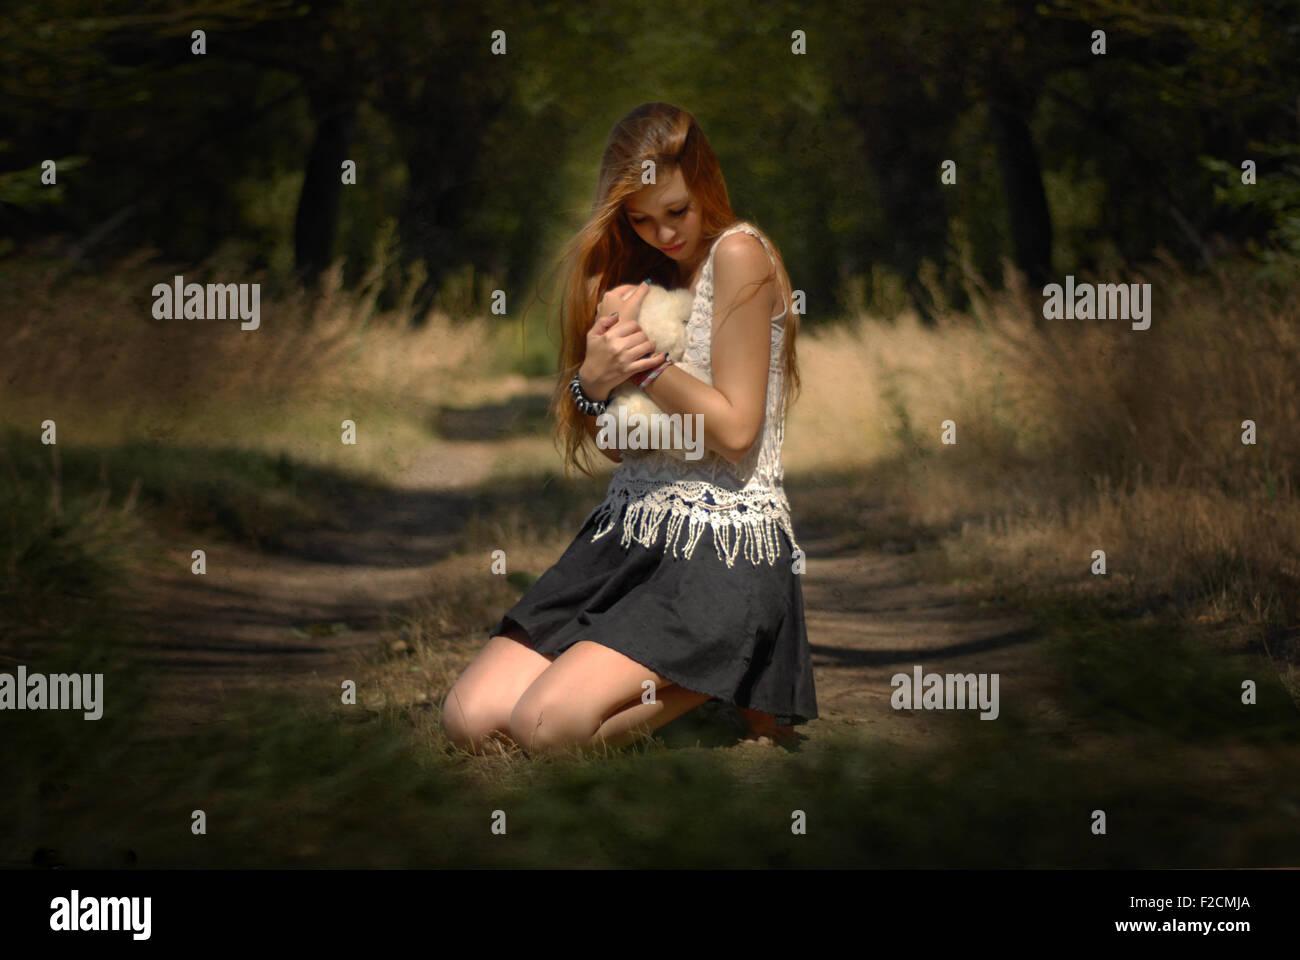 Âme perdue et de l'innocence - girl hugging teddy bear en forêt pleurer girl dans la forêt avec Photo Stock